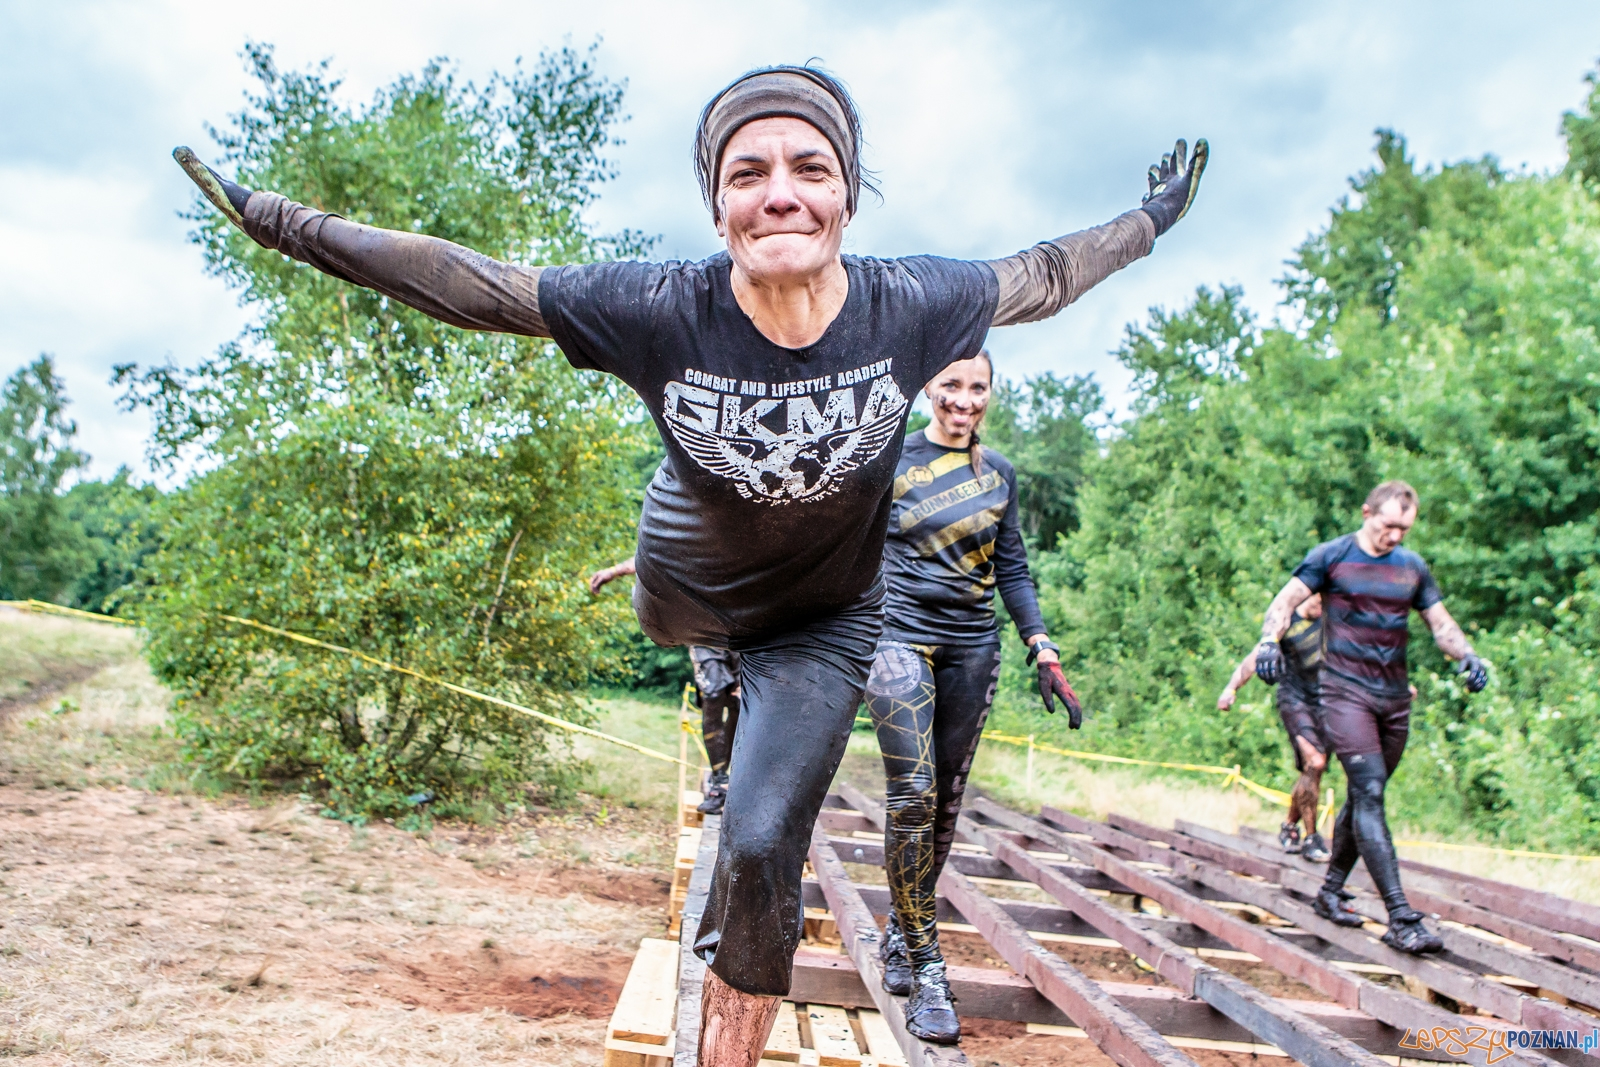 Runmageddon 2017 - Poznań 12.08.2017 r.  Foto: LepszyPOZNAN.pl / Paweł Rychter